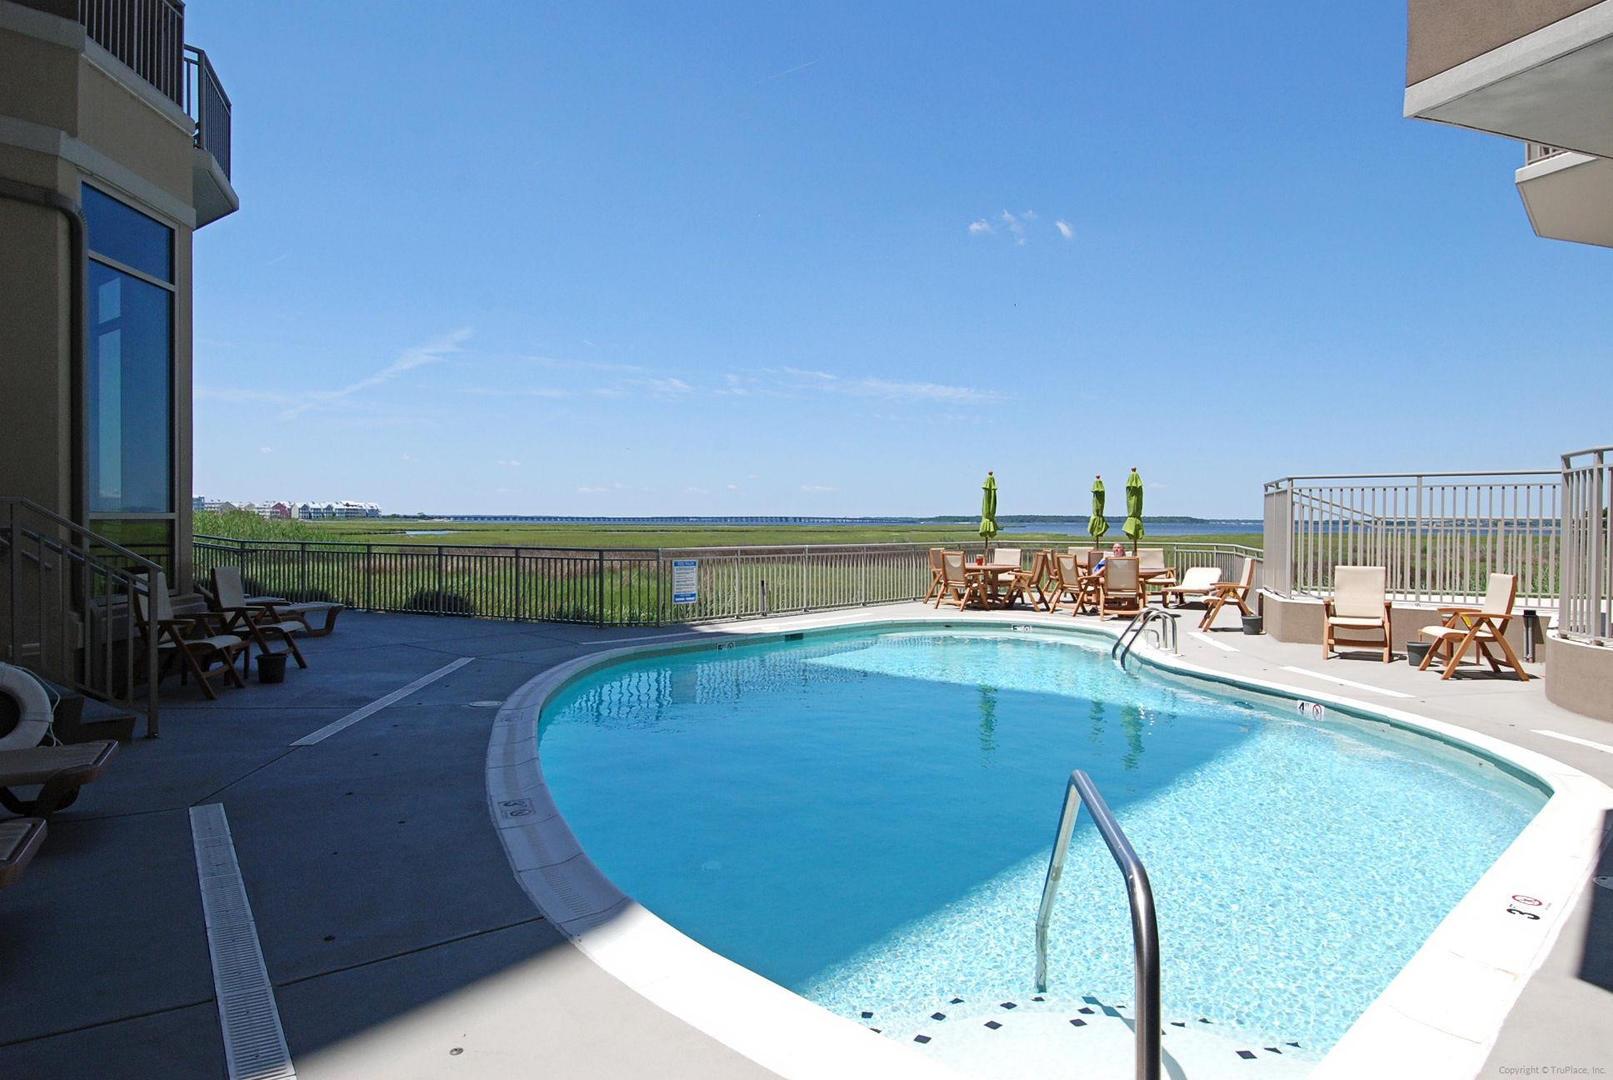 Rivendell - Outdoor Pool (open seasonally)